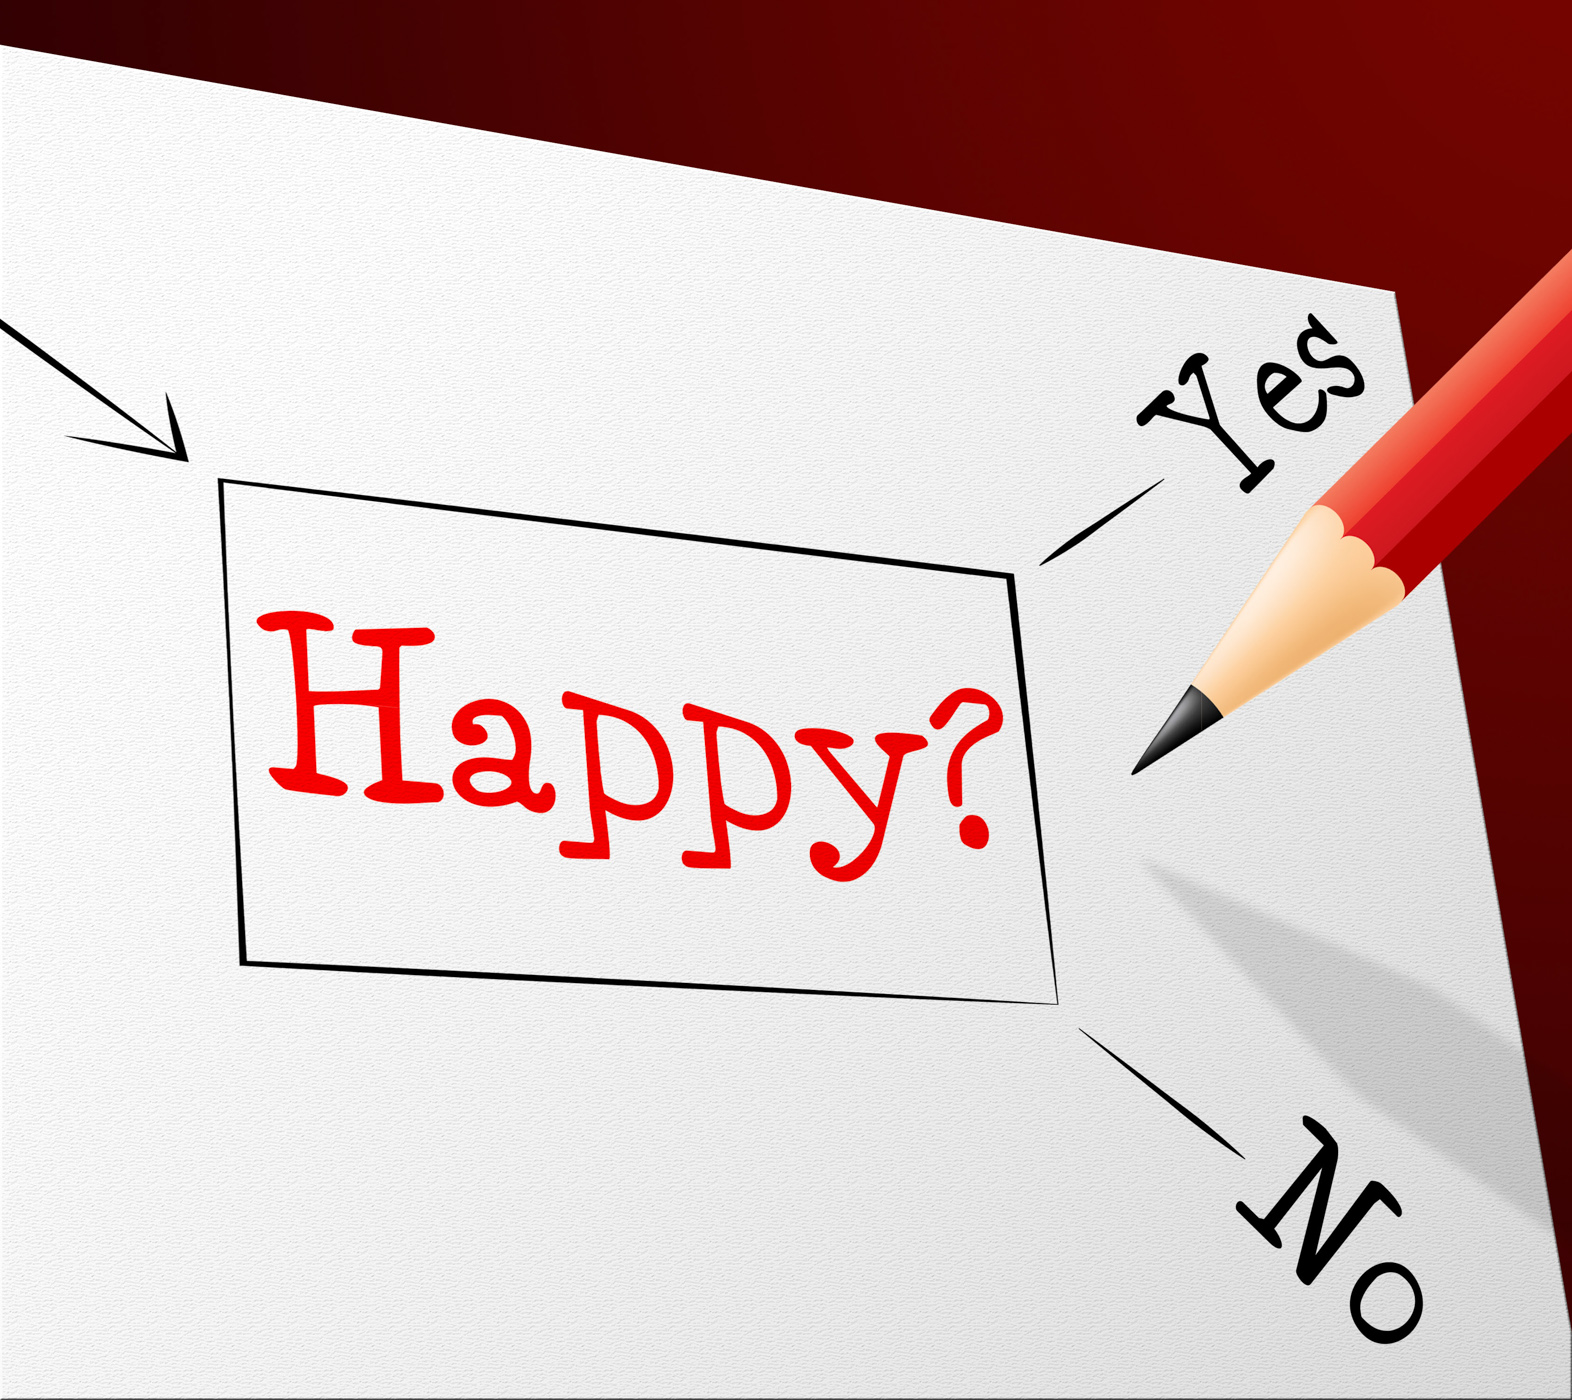 Happy choice represents joy cheerful and alternative photo